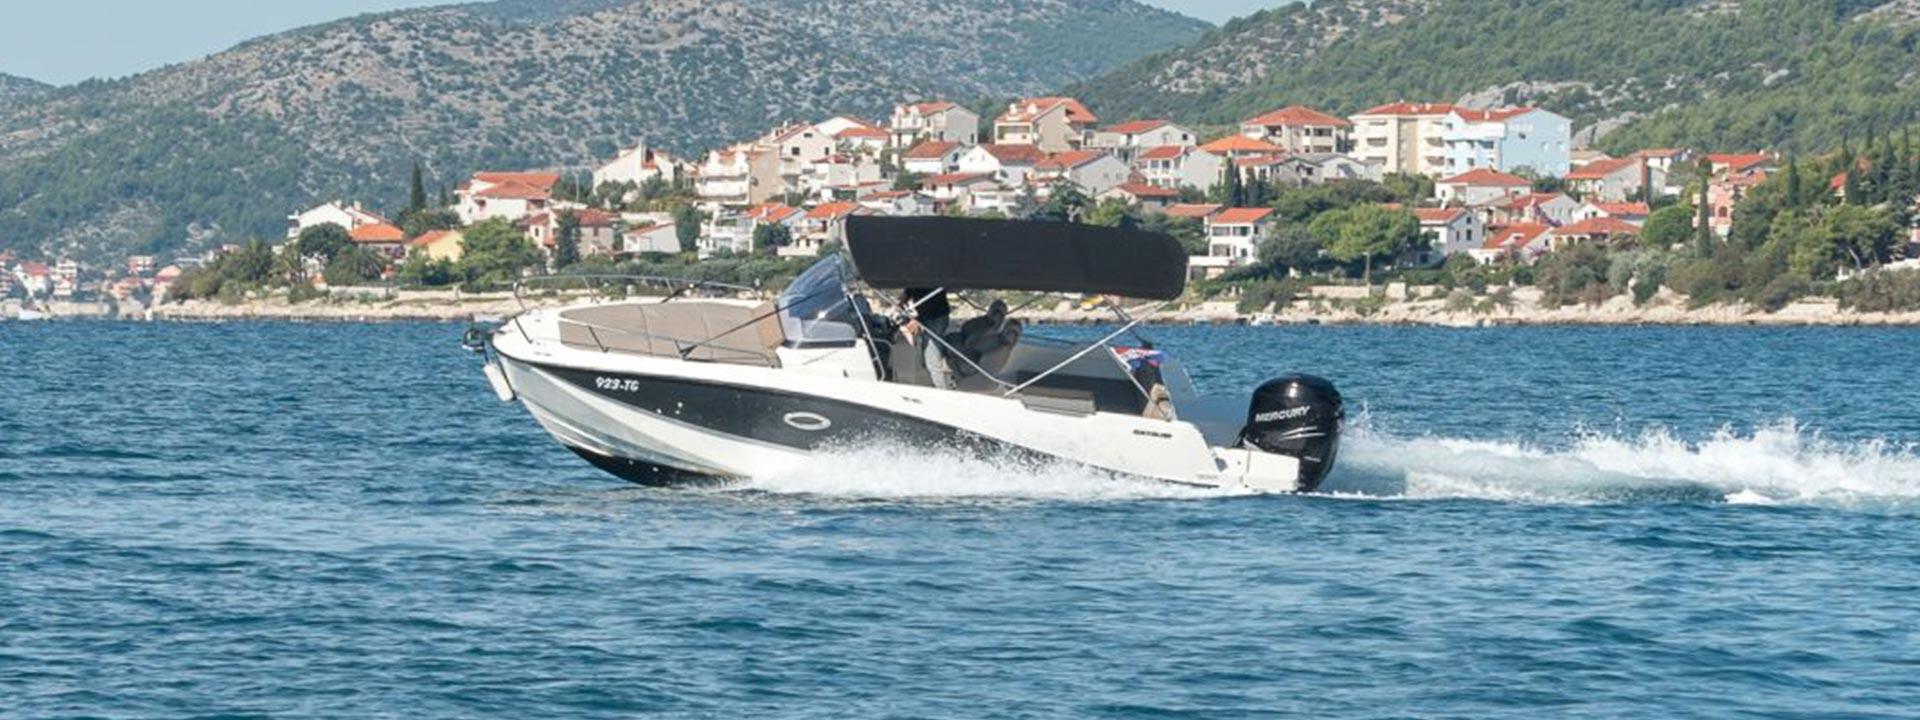 mayer-charter-boat-header-quicksilver-activ-755-sundeck-01